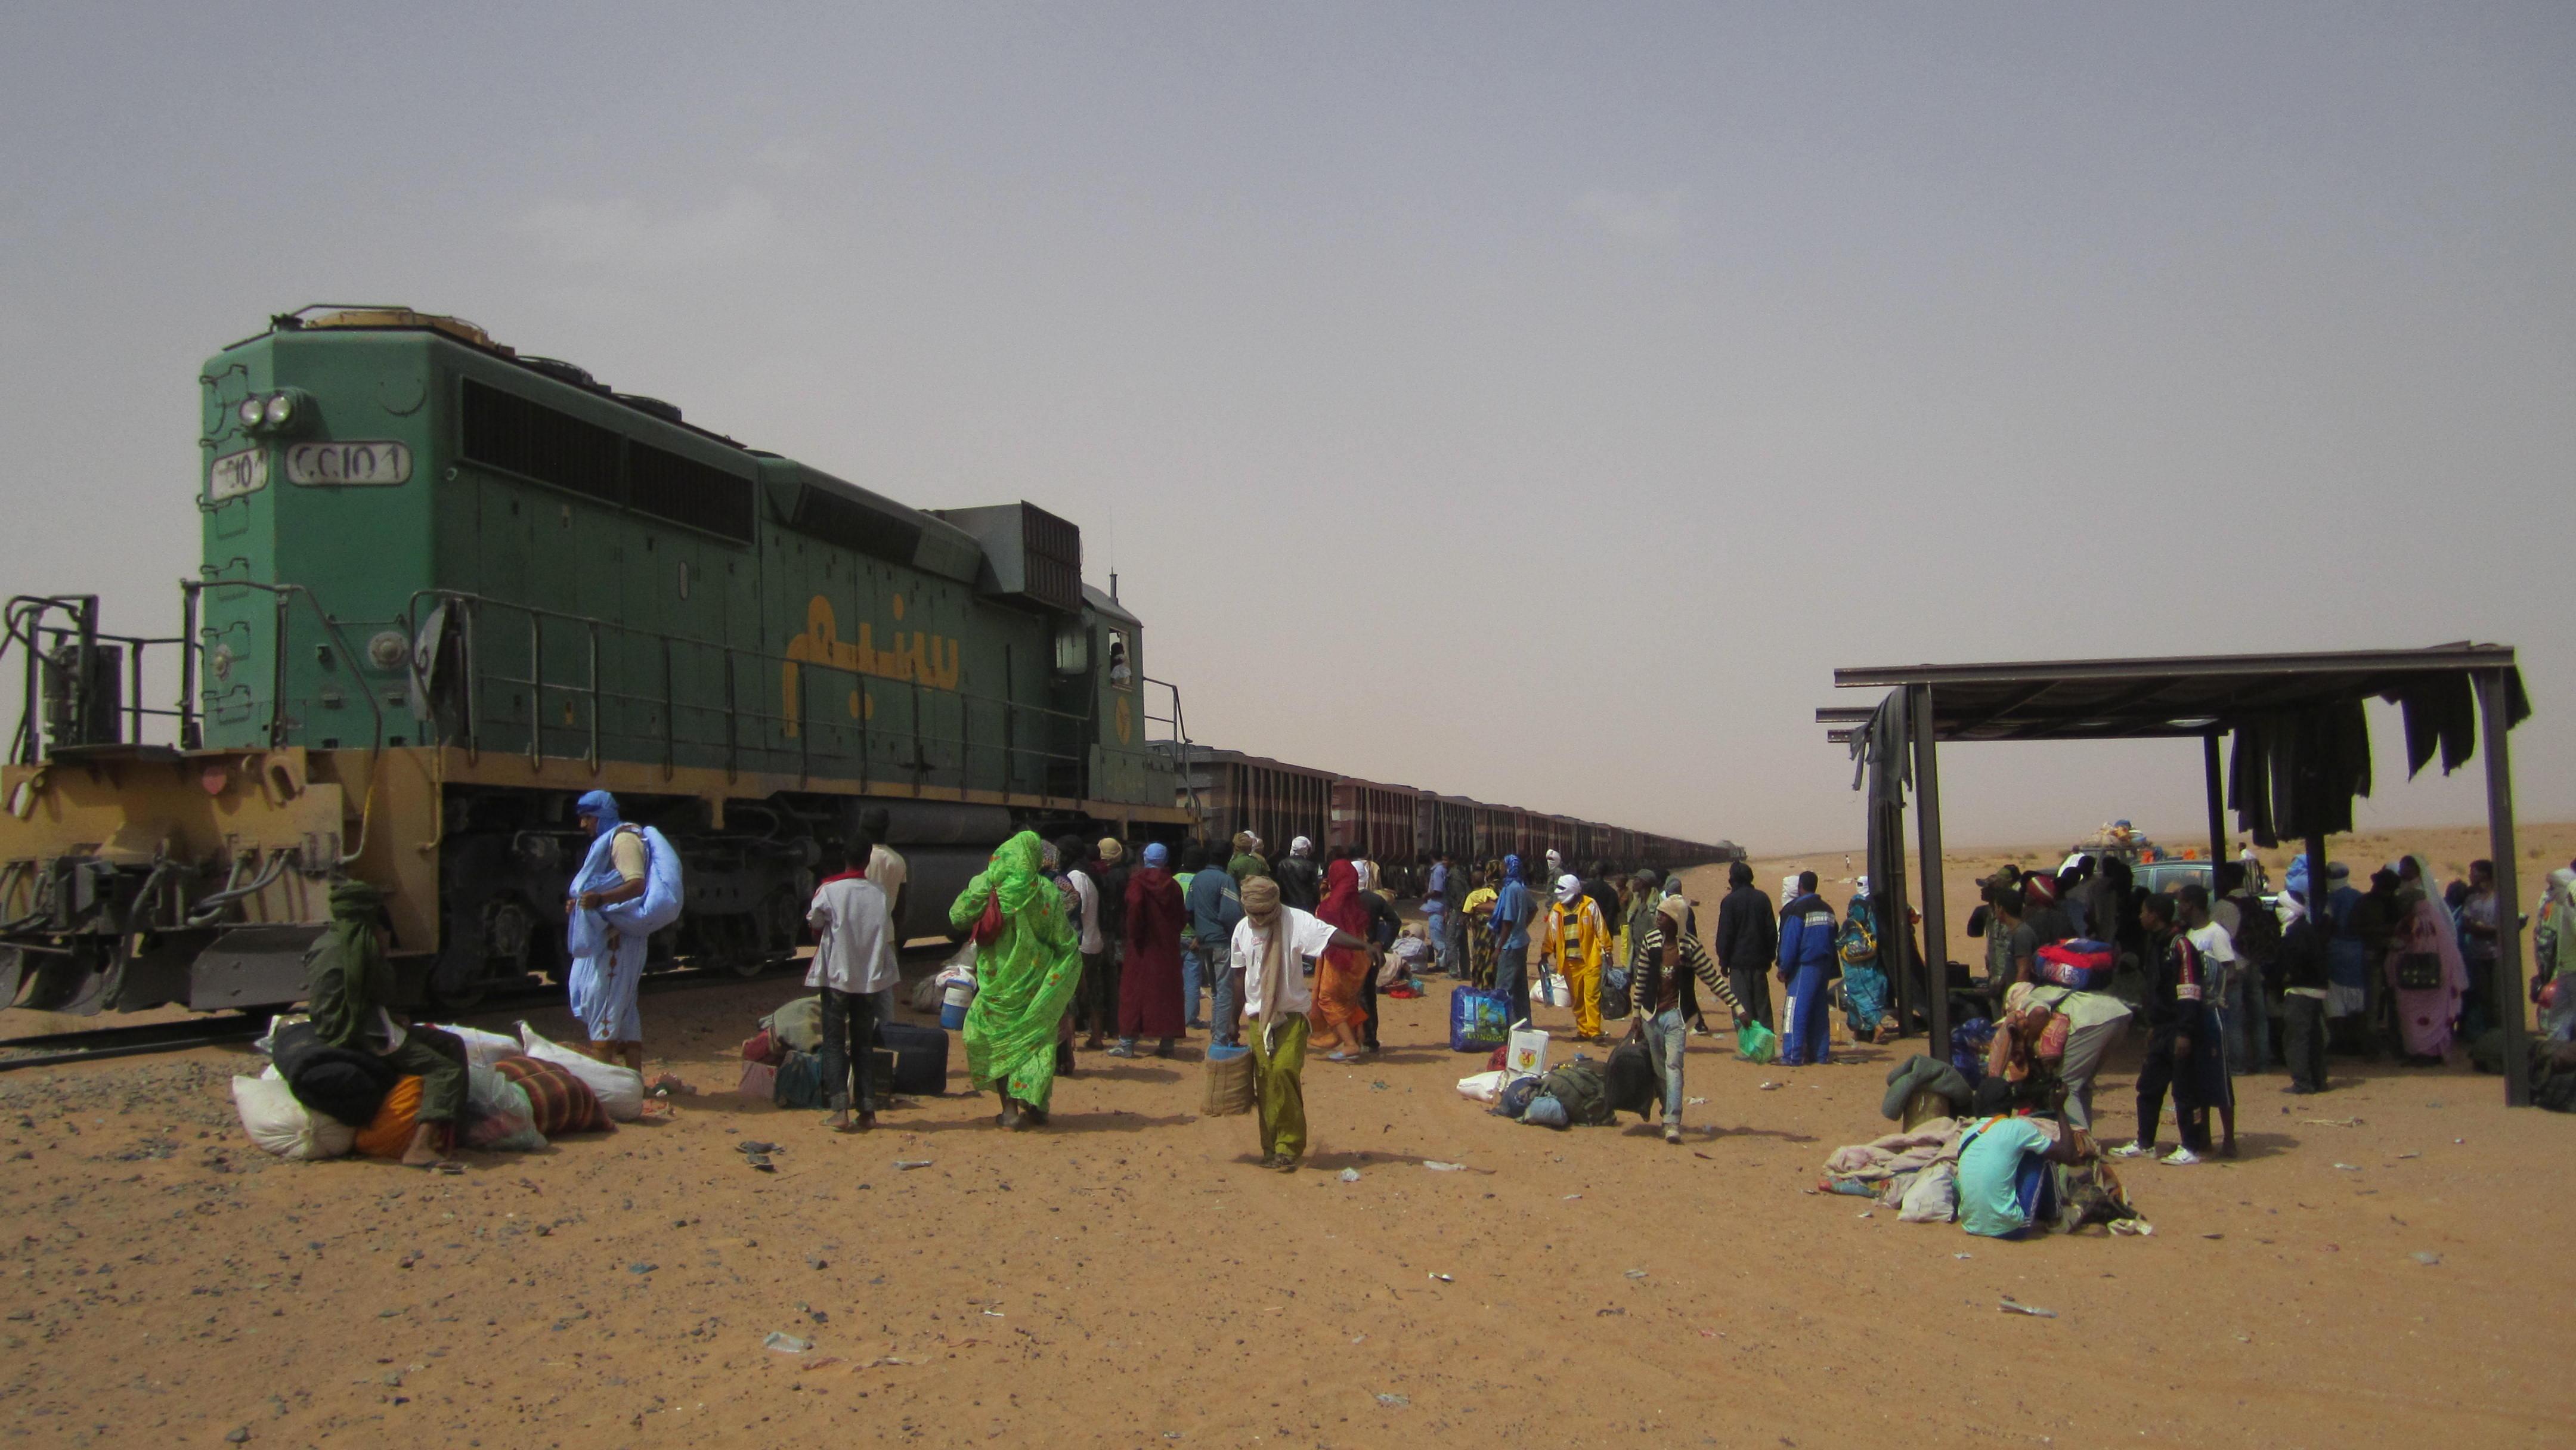 Tren de mineral en Mauritania_04